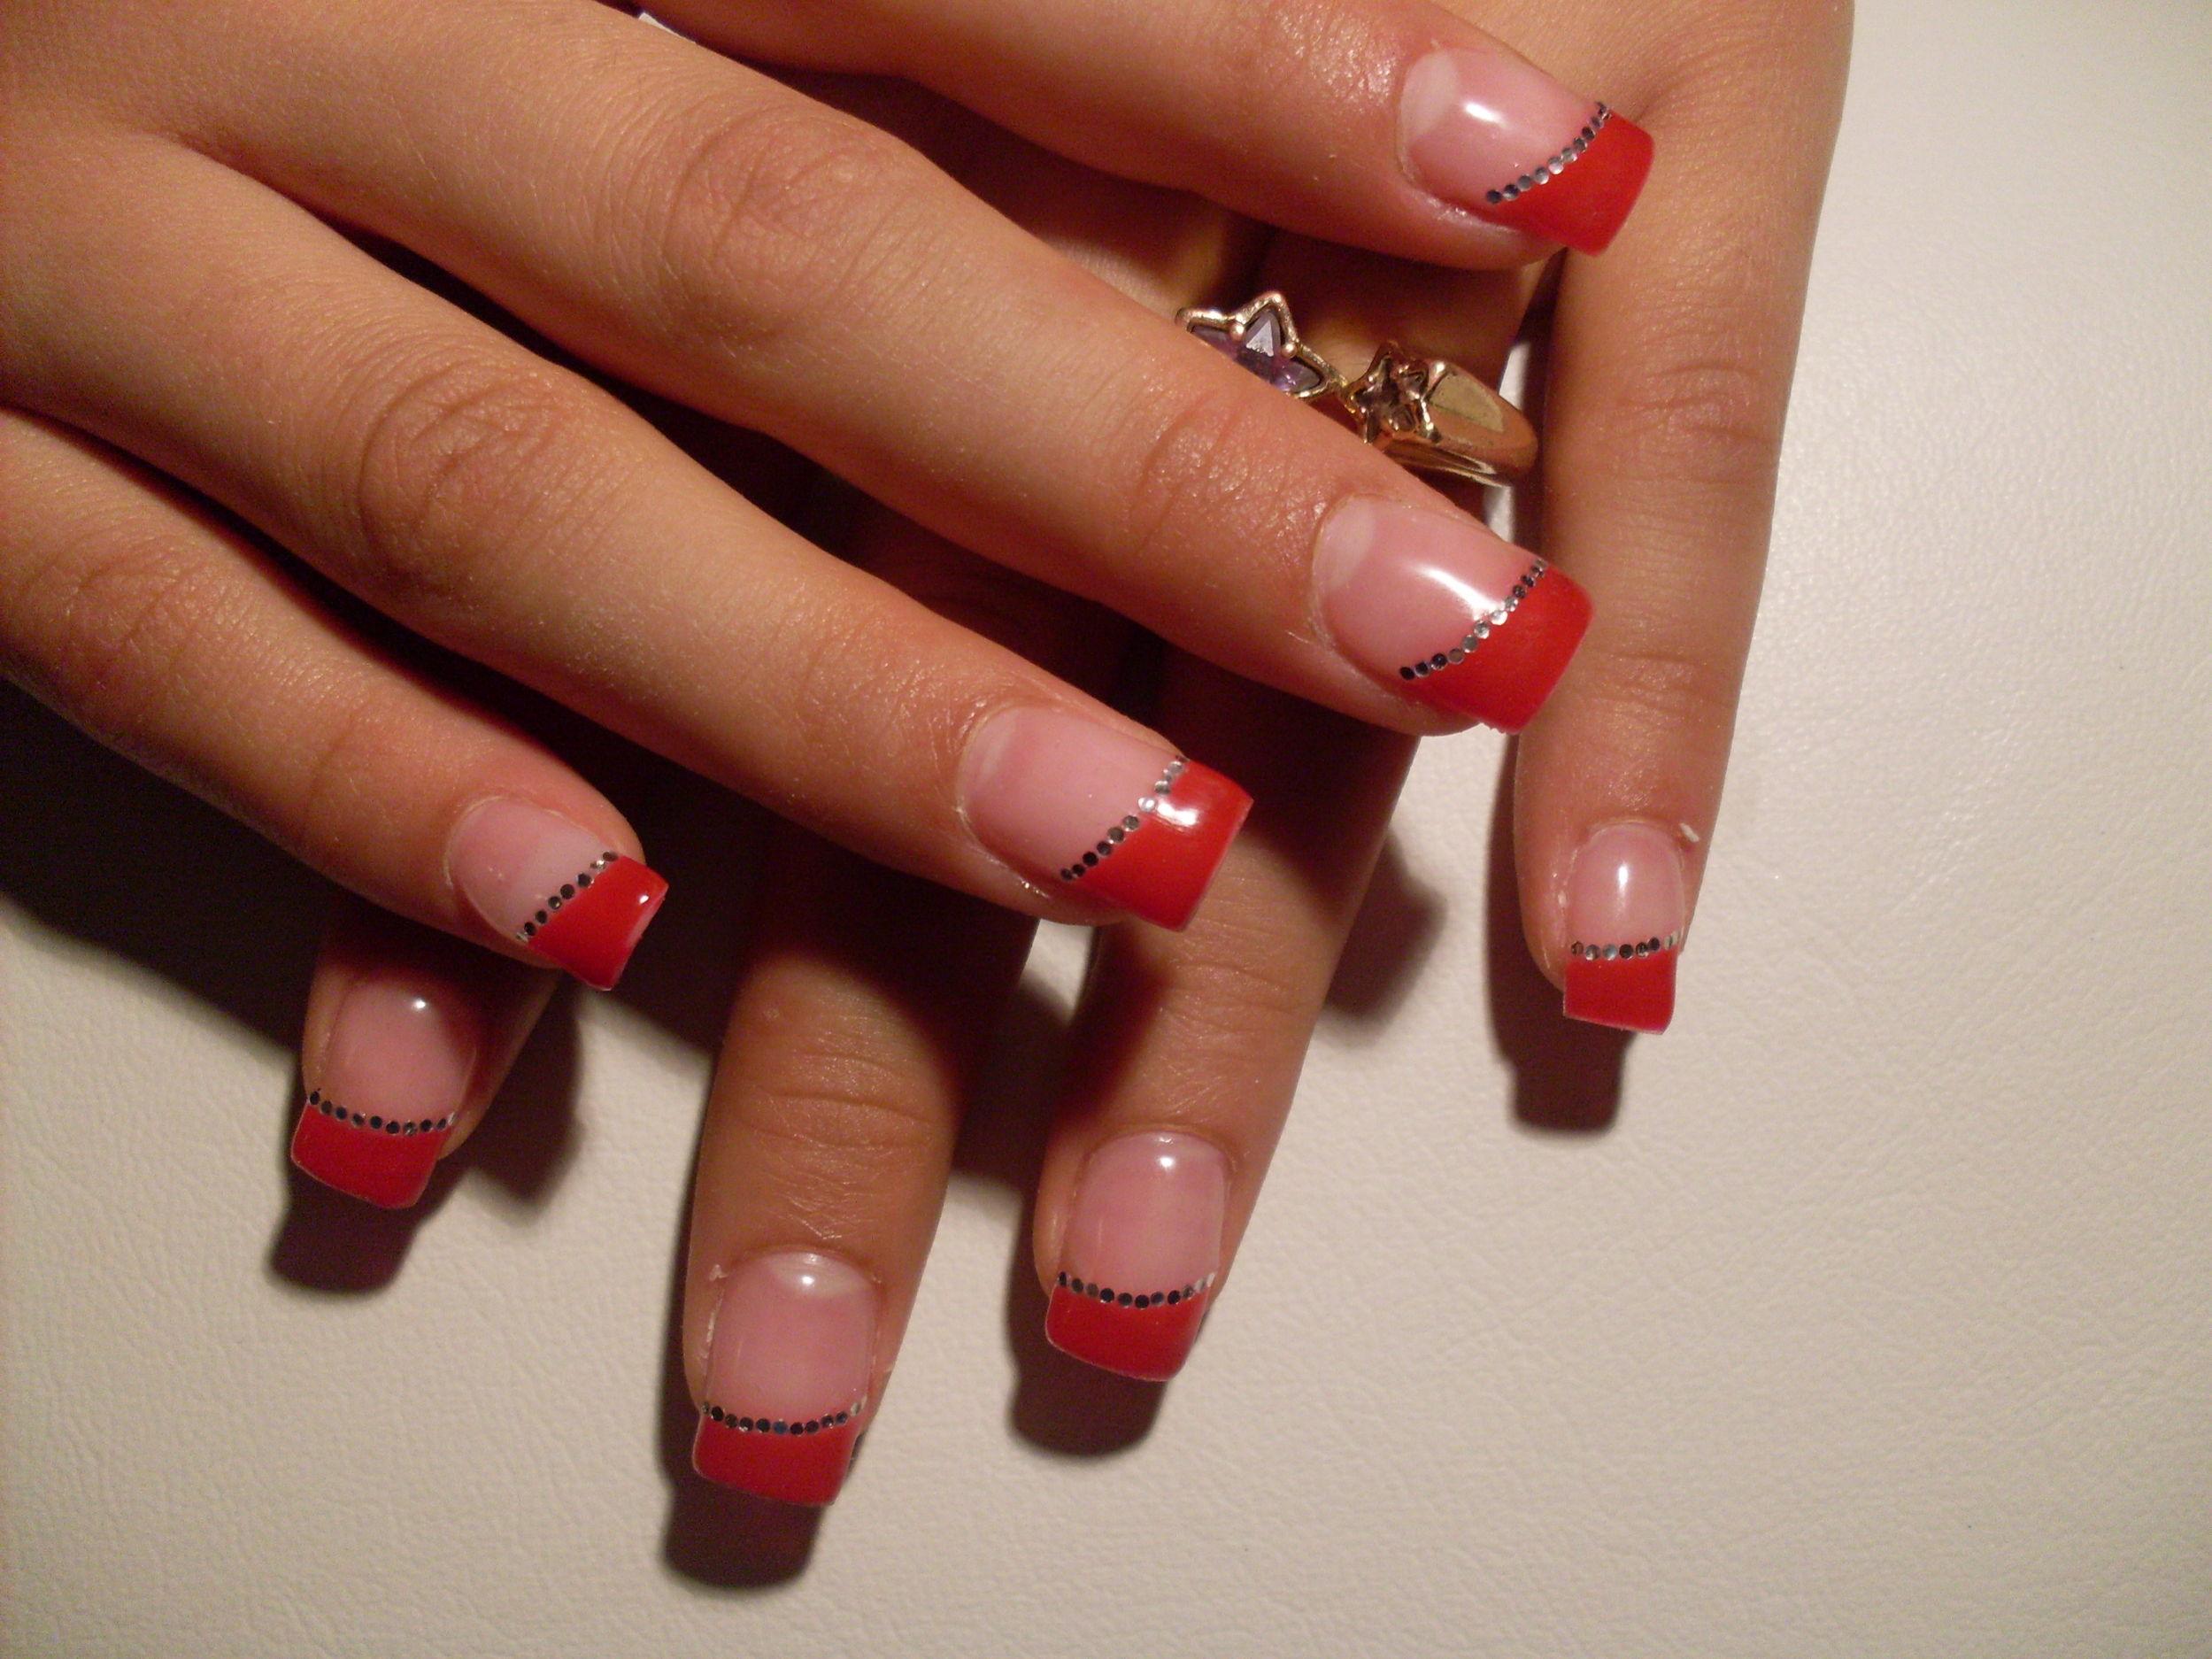 Eccezionale Nail-art Gallery | E-nail Gallery - Nail-art gallery/gel rosso con  KK78